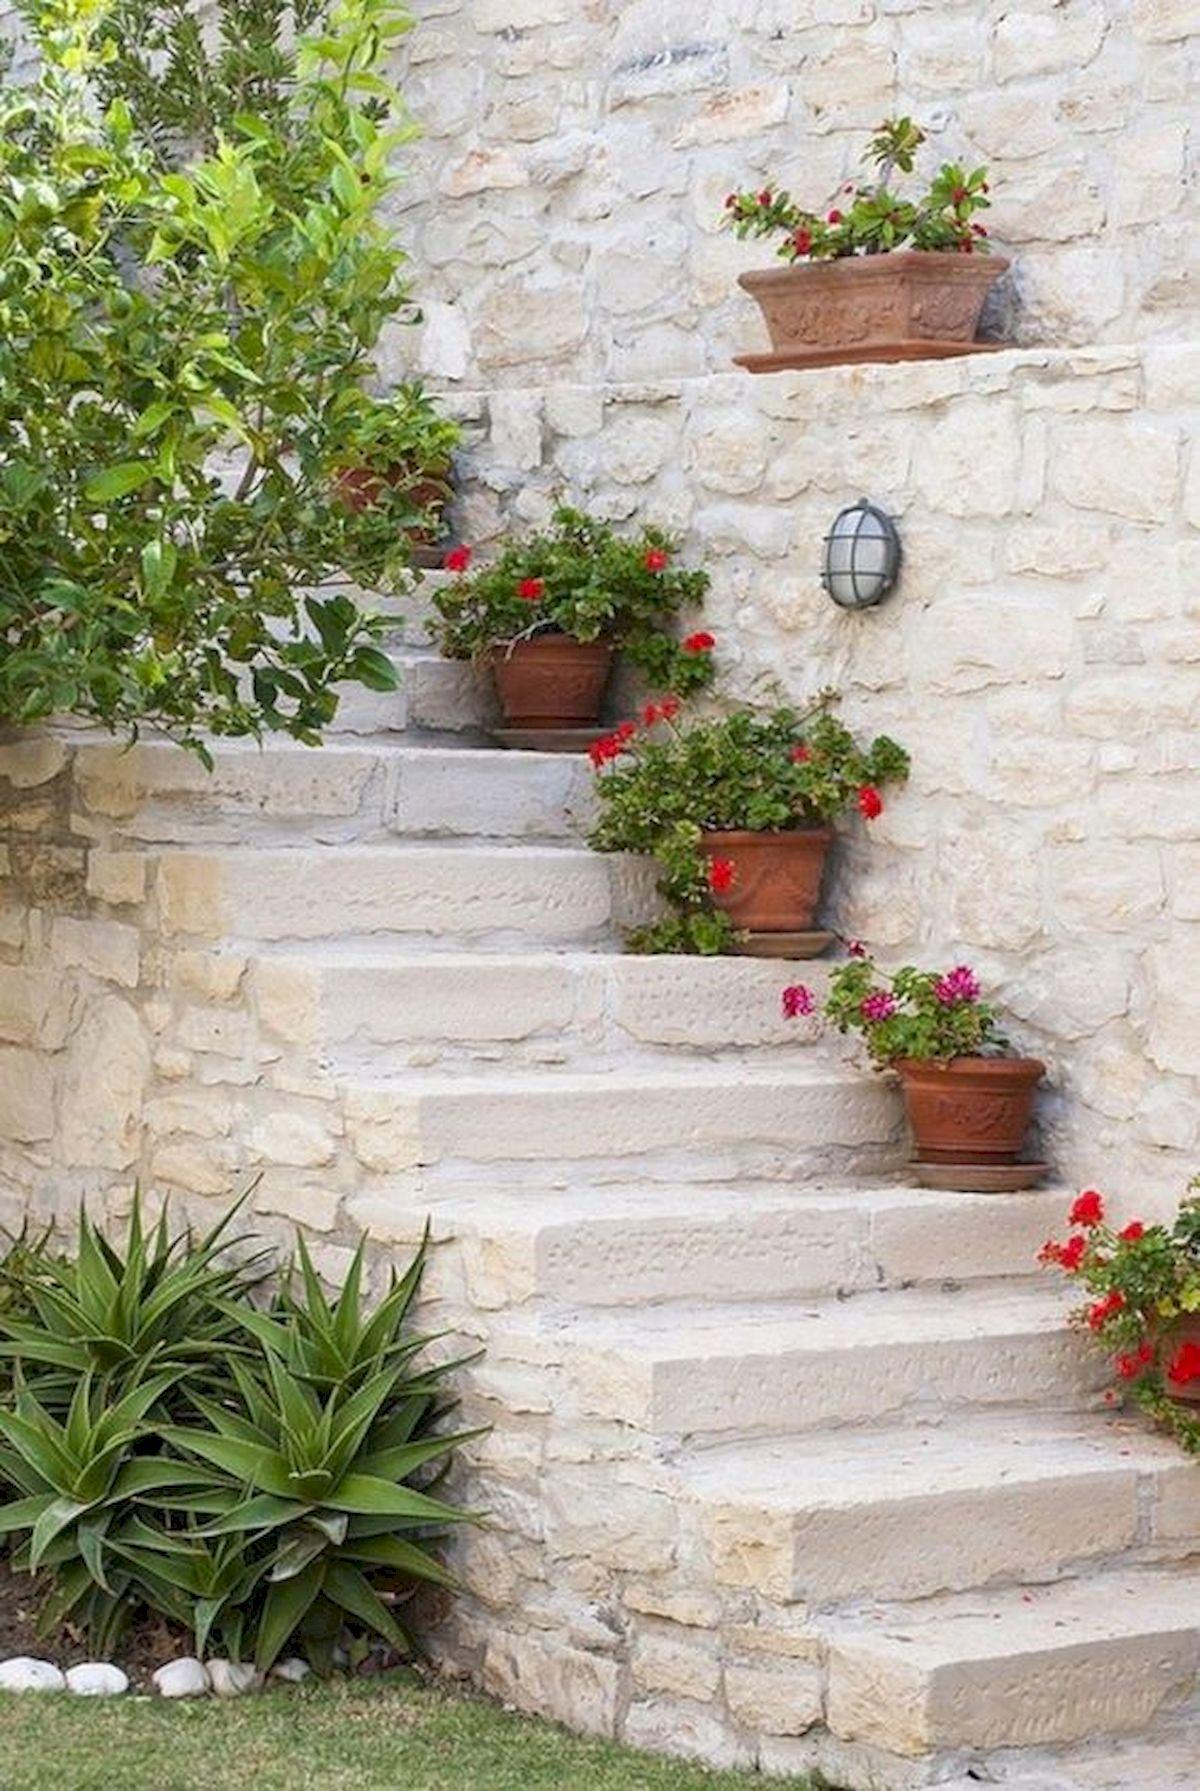 50 Awesome DIY Hanging Plants Ideas For Modern Backyard Garden (26)